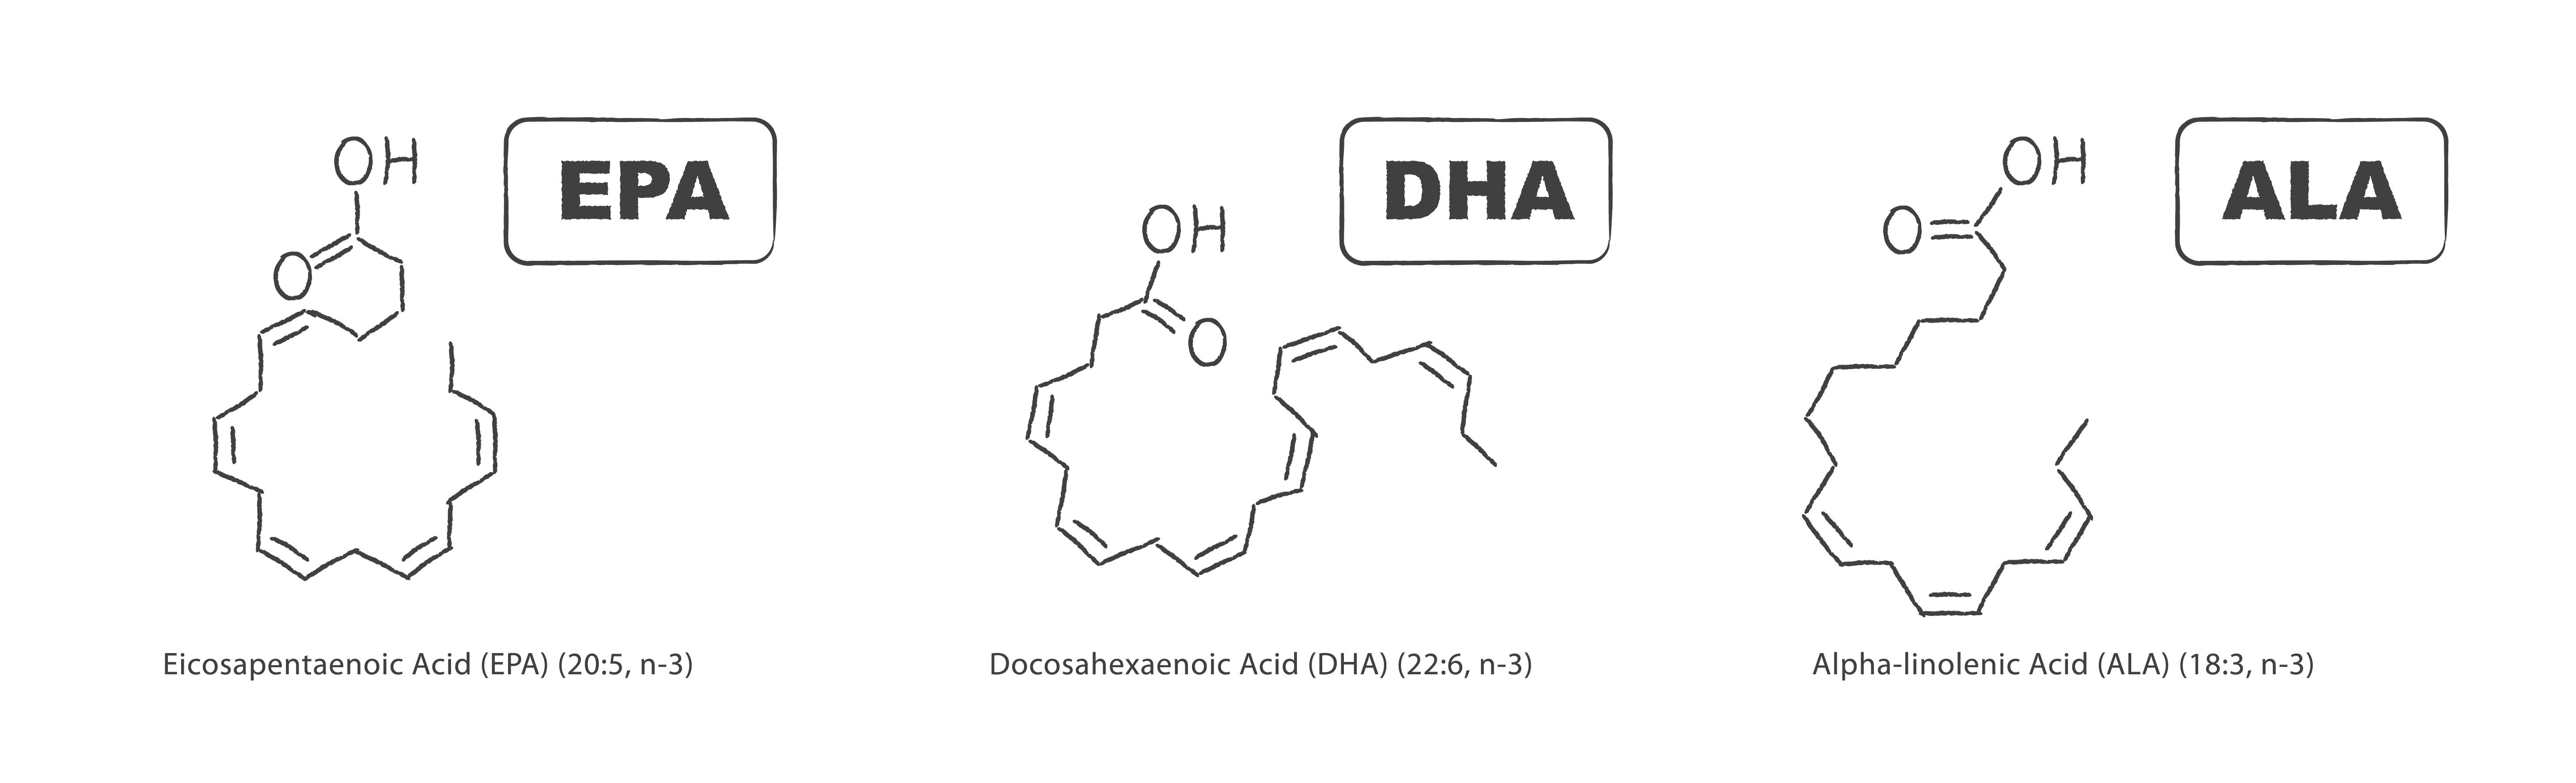 Most basic of omega 3 fatty acids - EPA, DHA and ALA